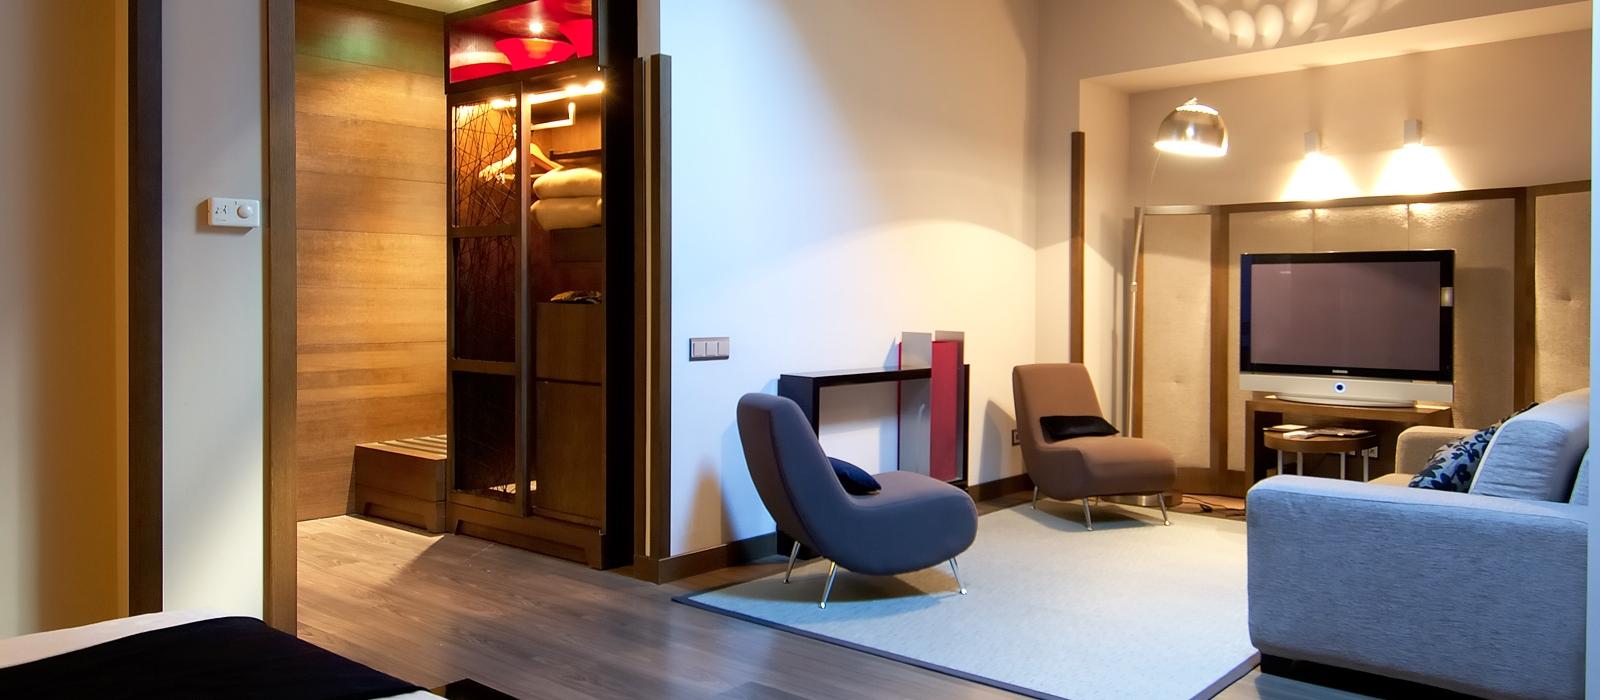 Chambres Soho Hôtel Madrid - Vincci Hoteles - Suite Junior